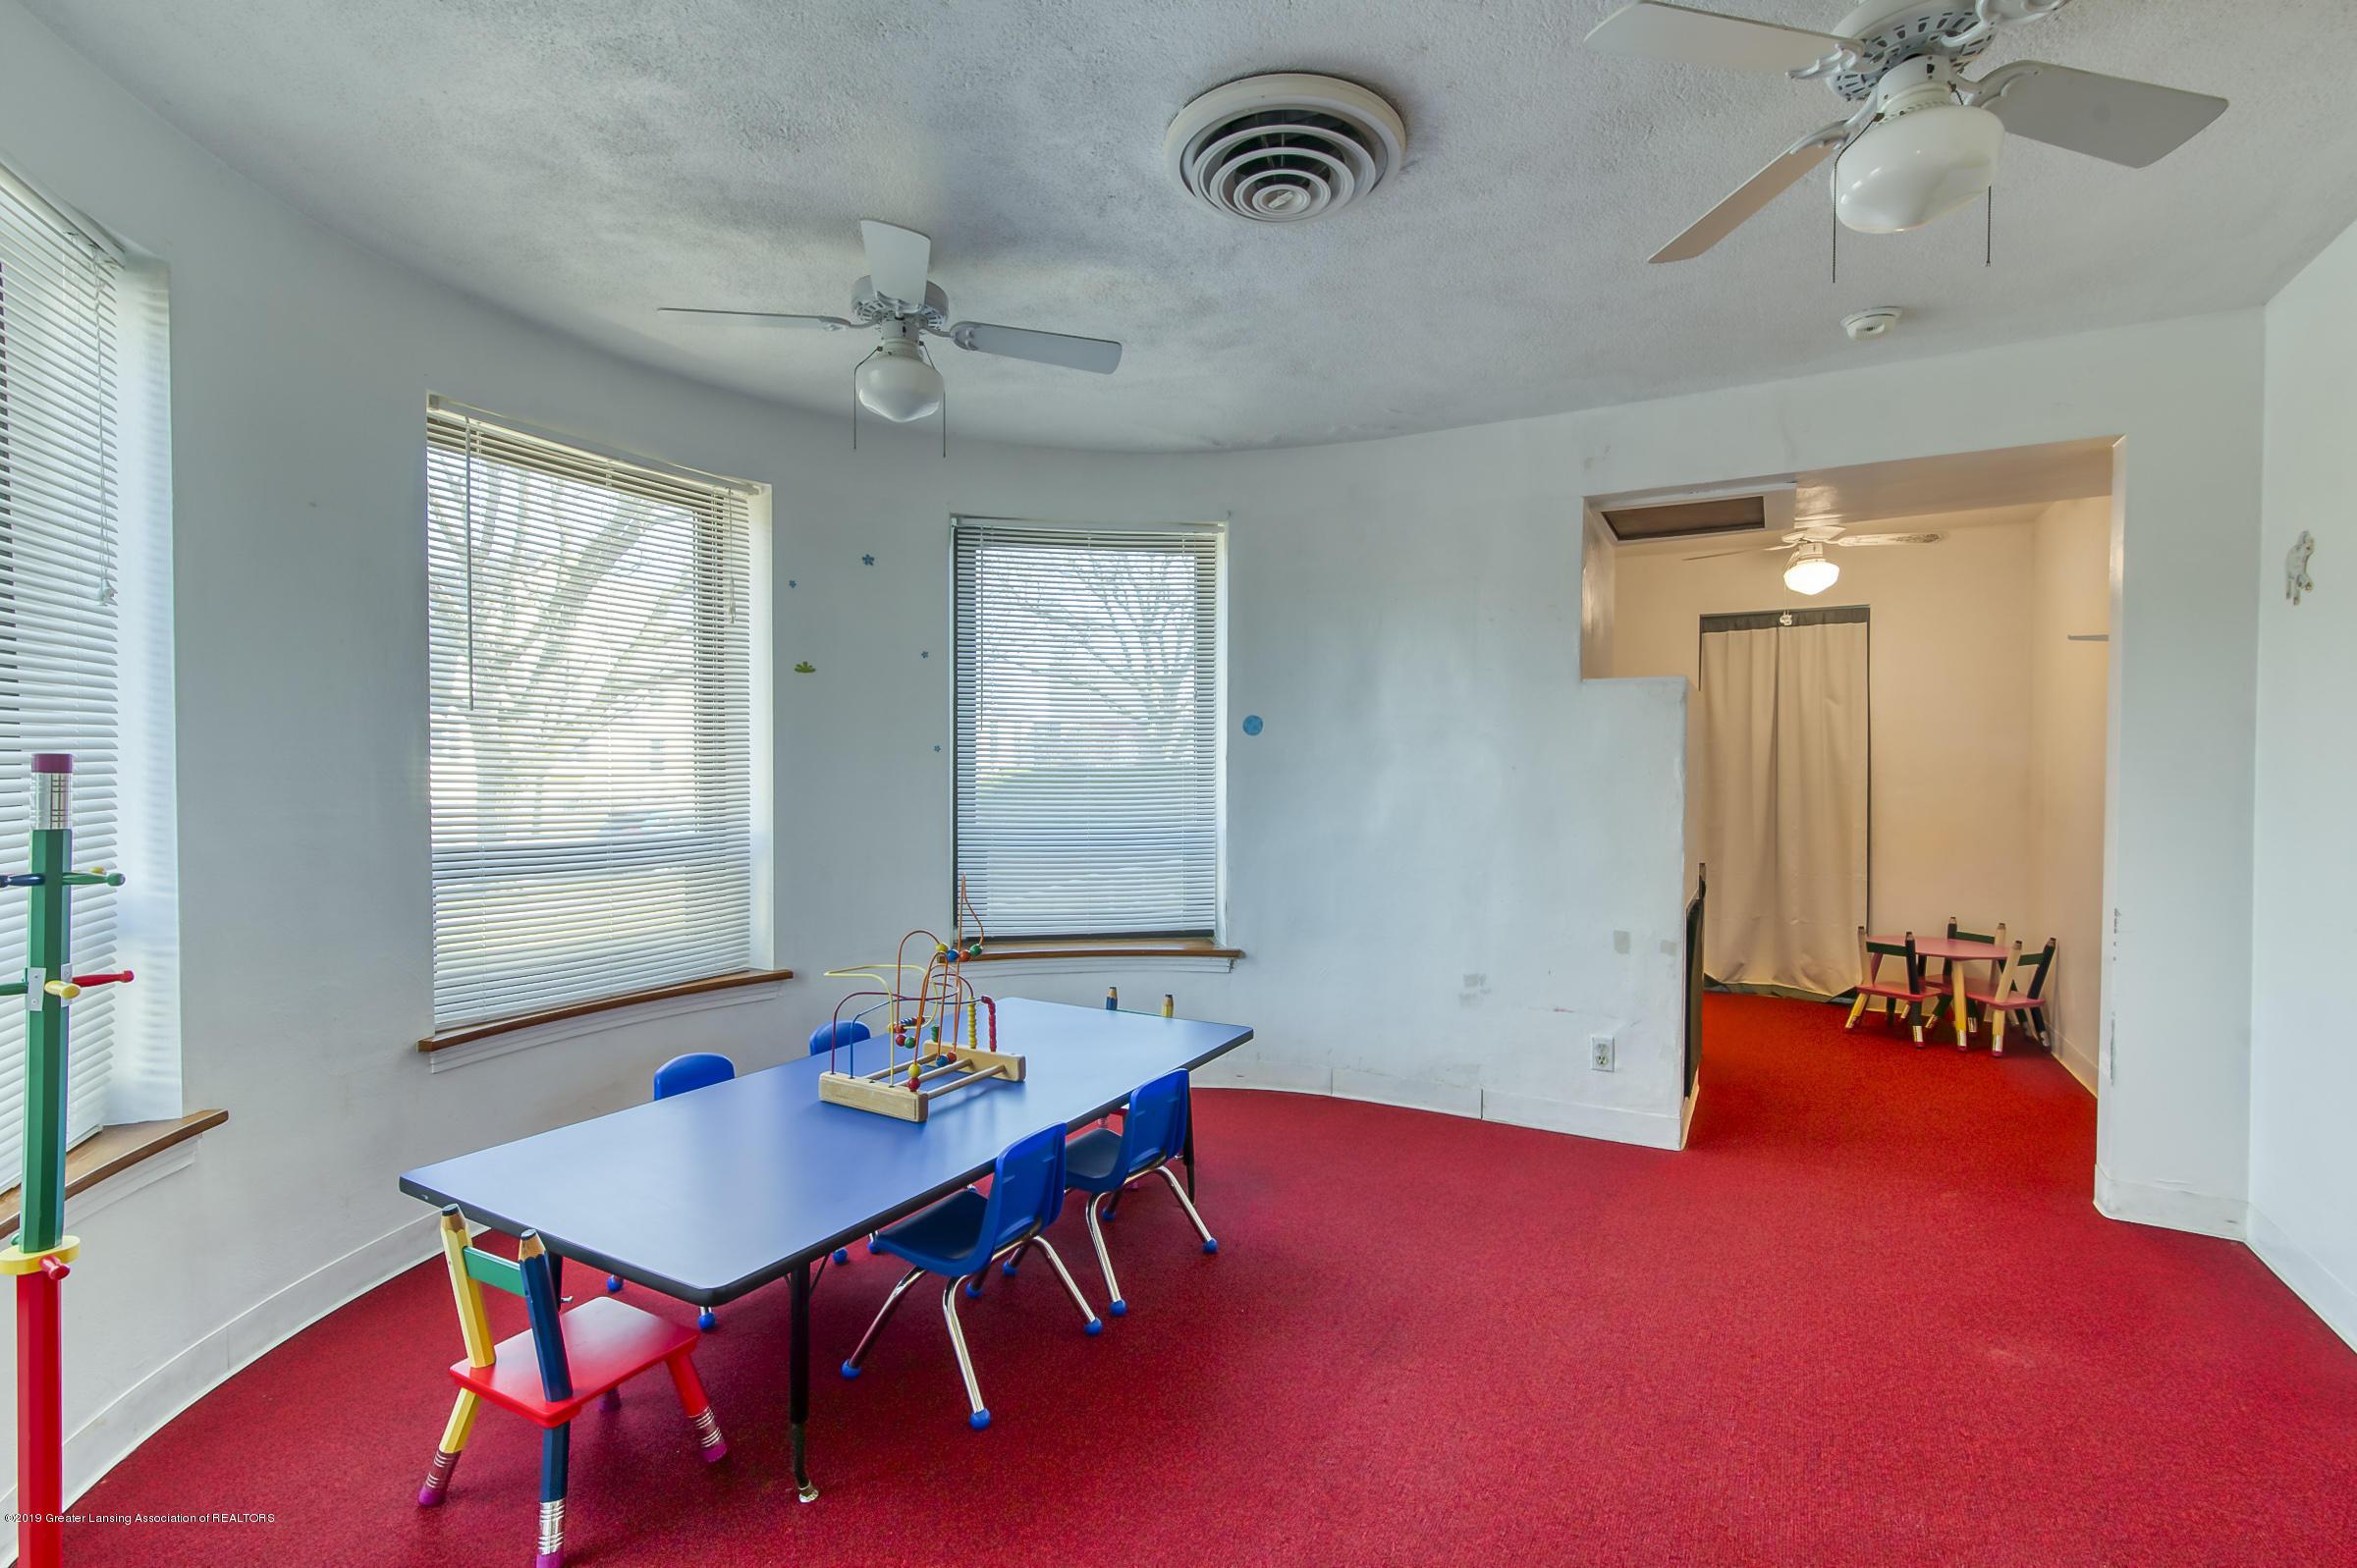 505 Seymour Ave - Classroom - 19